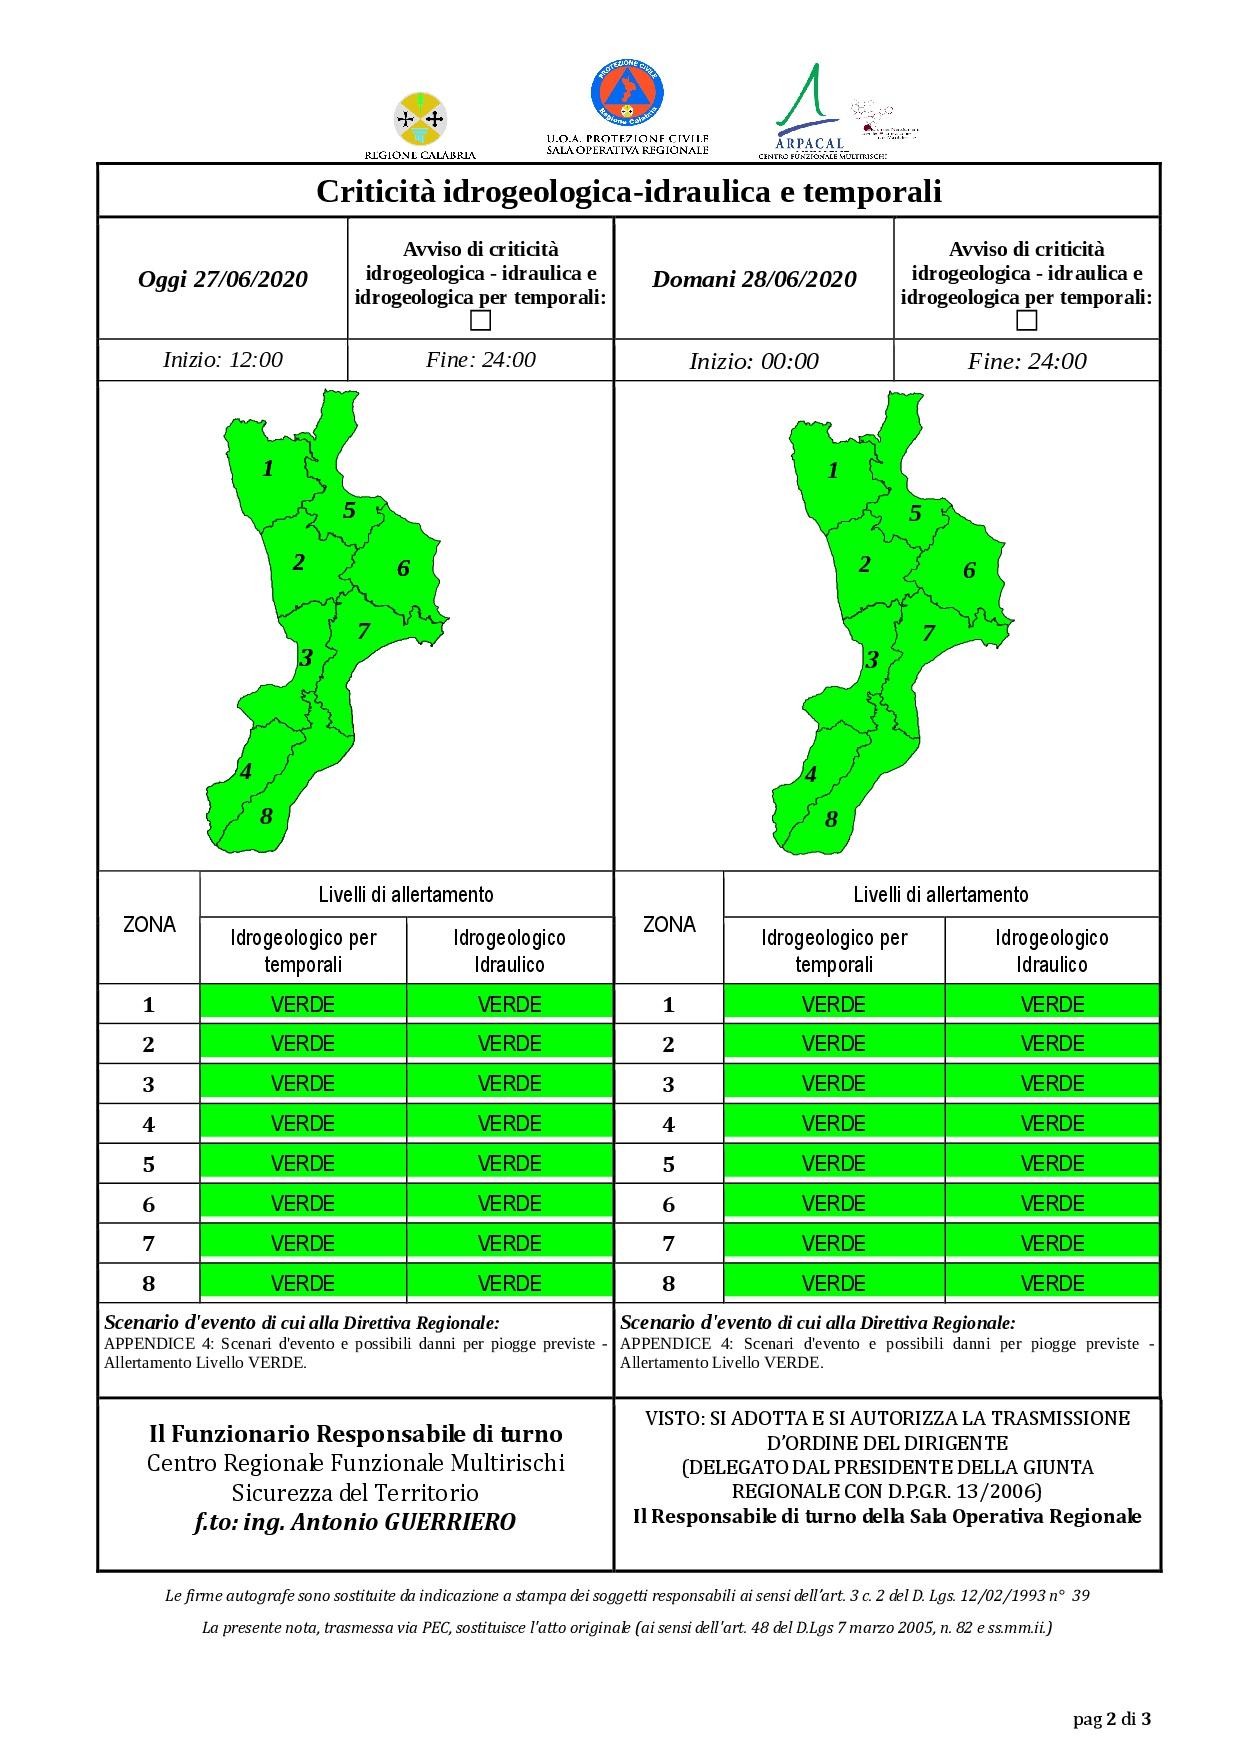 Criticità idrogeologica-idraulica e temporali in Calabria 27-06-2020